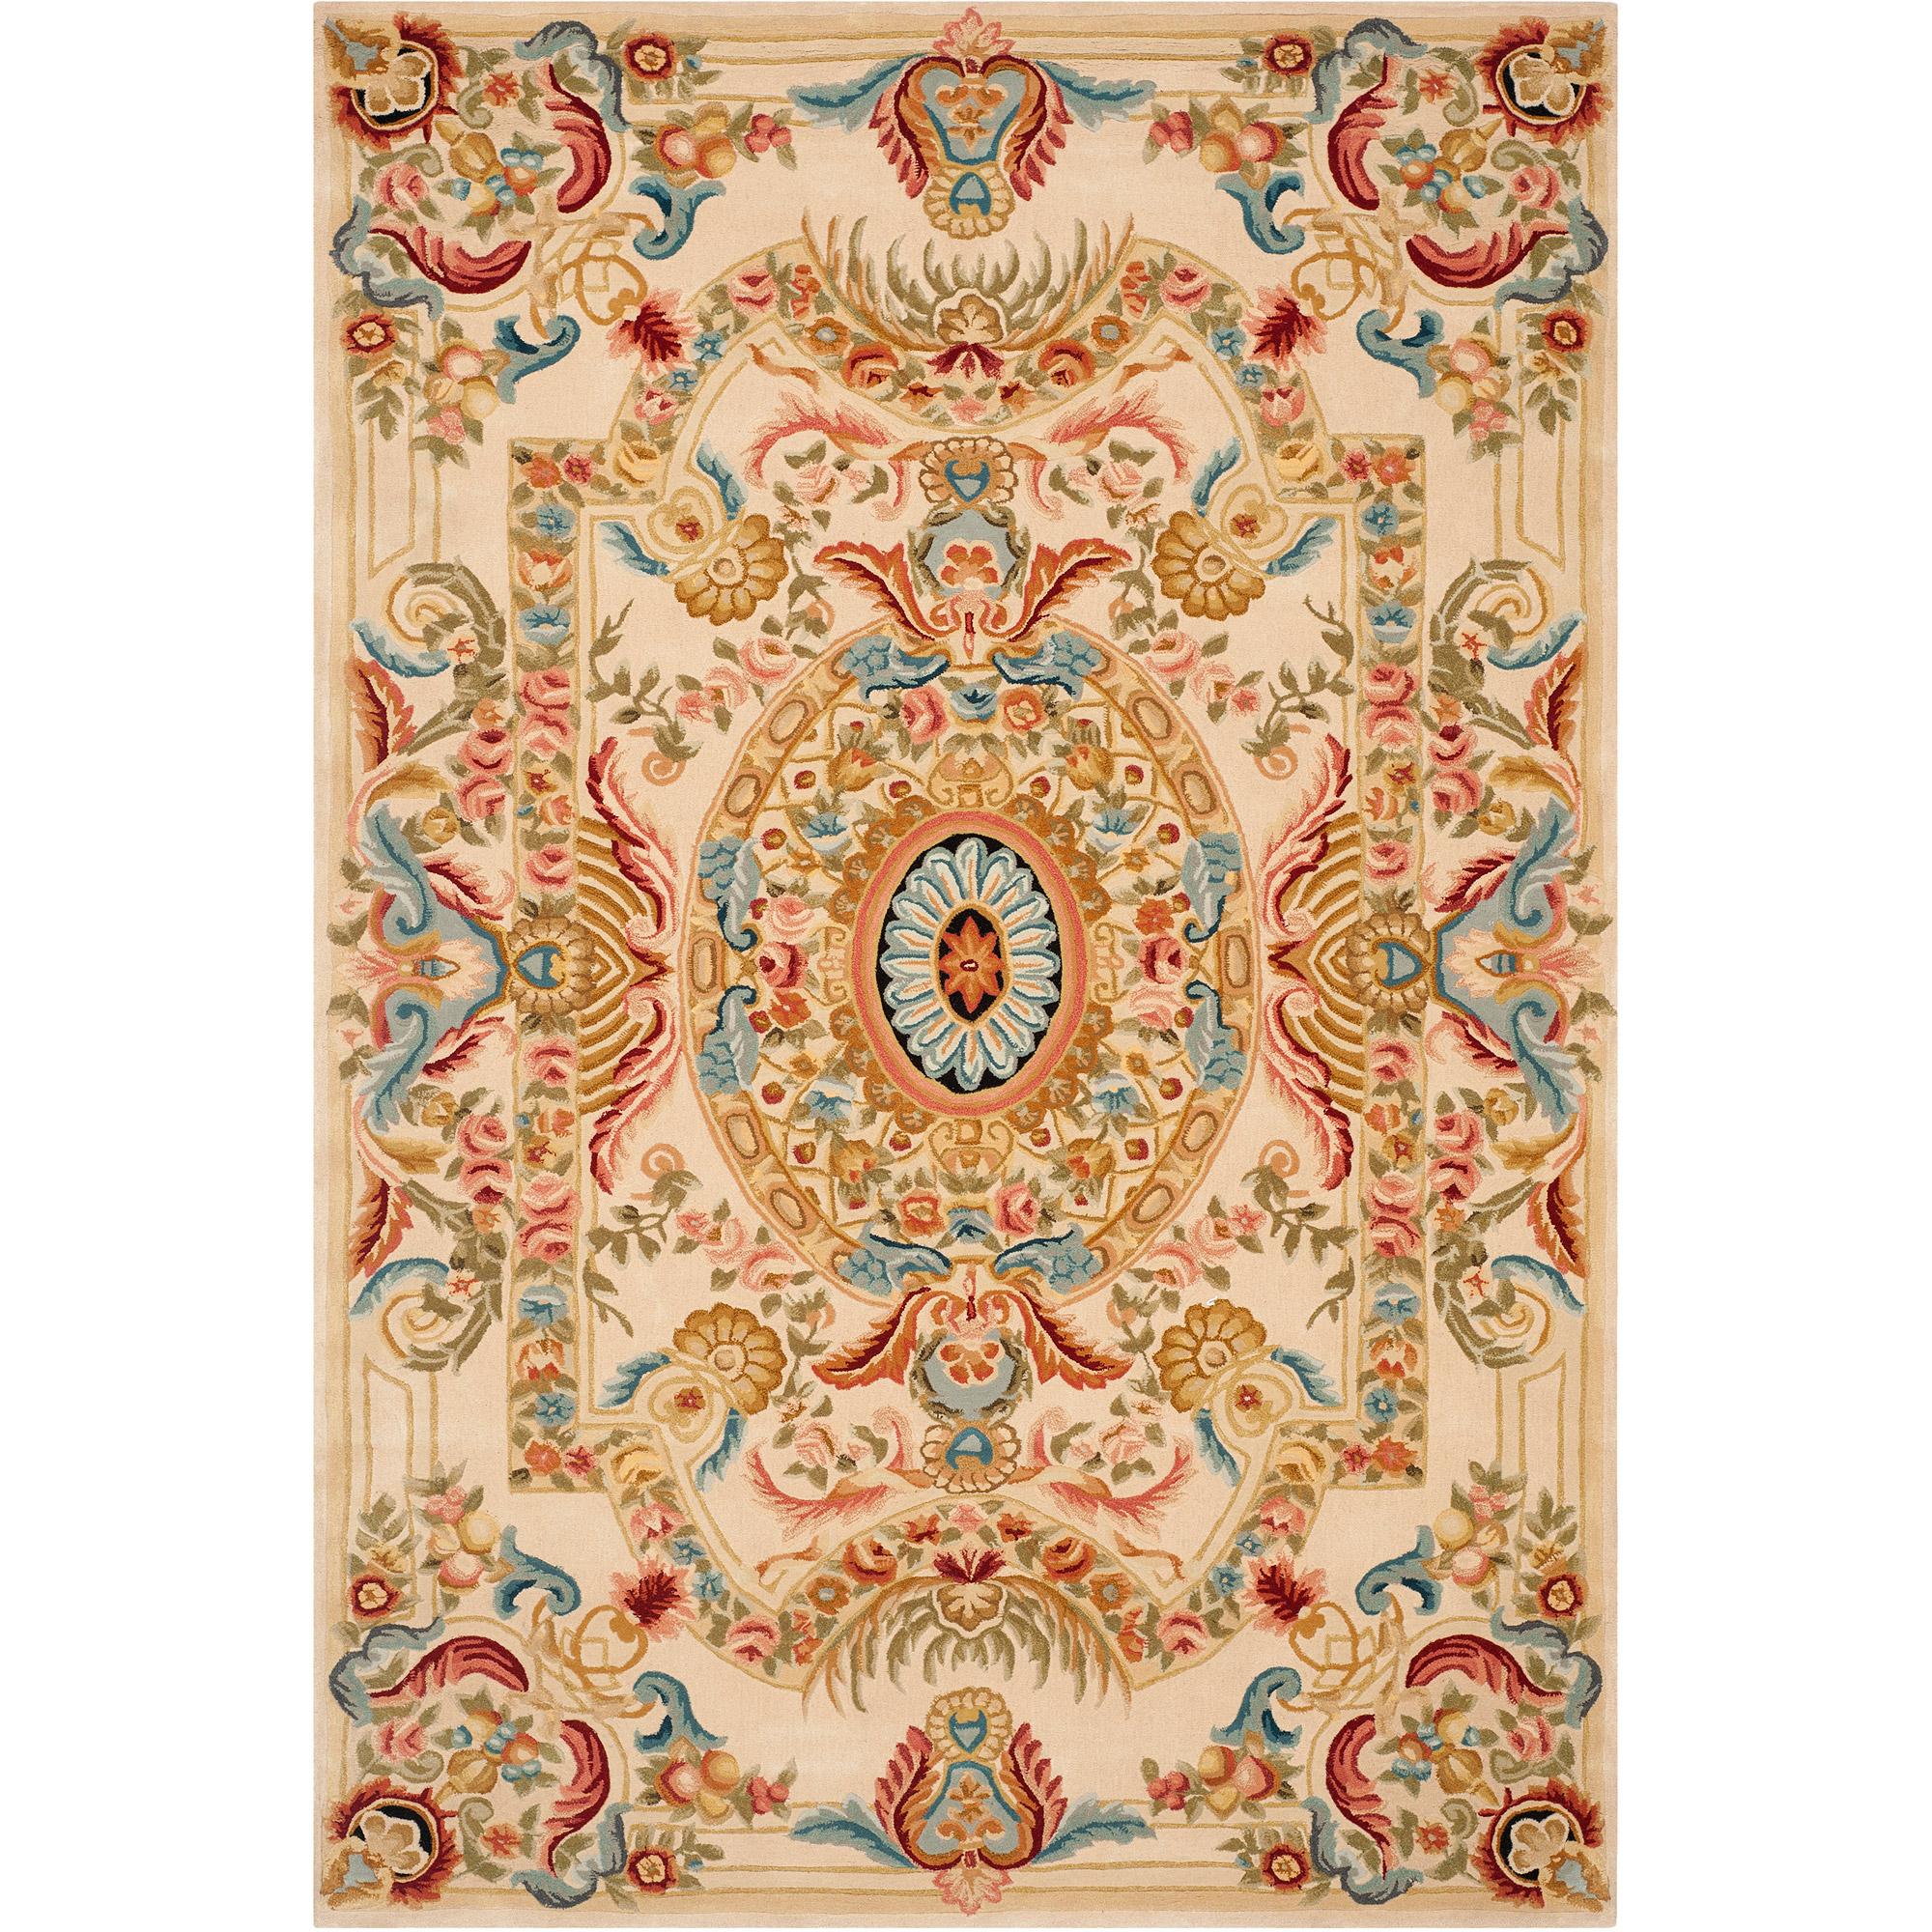 Safavieh Savonnerie Alphonse Hand-Tufted Wool Area Rug, Sage/Beige